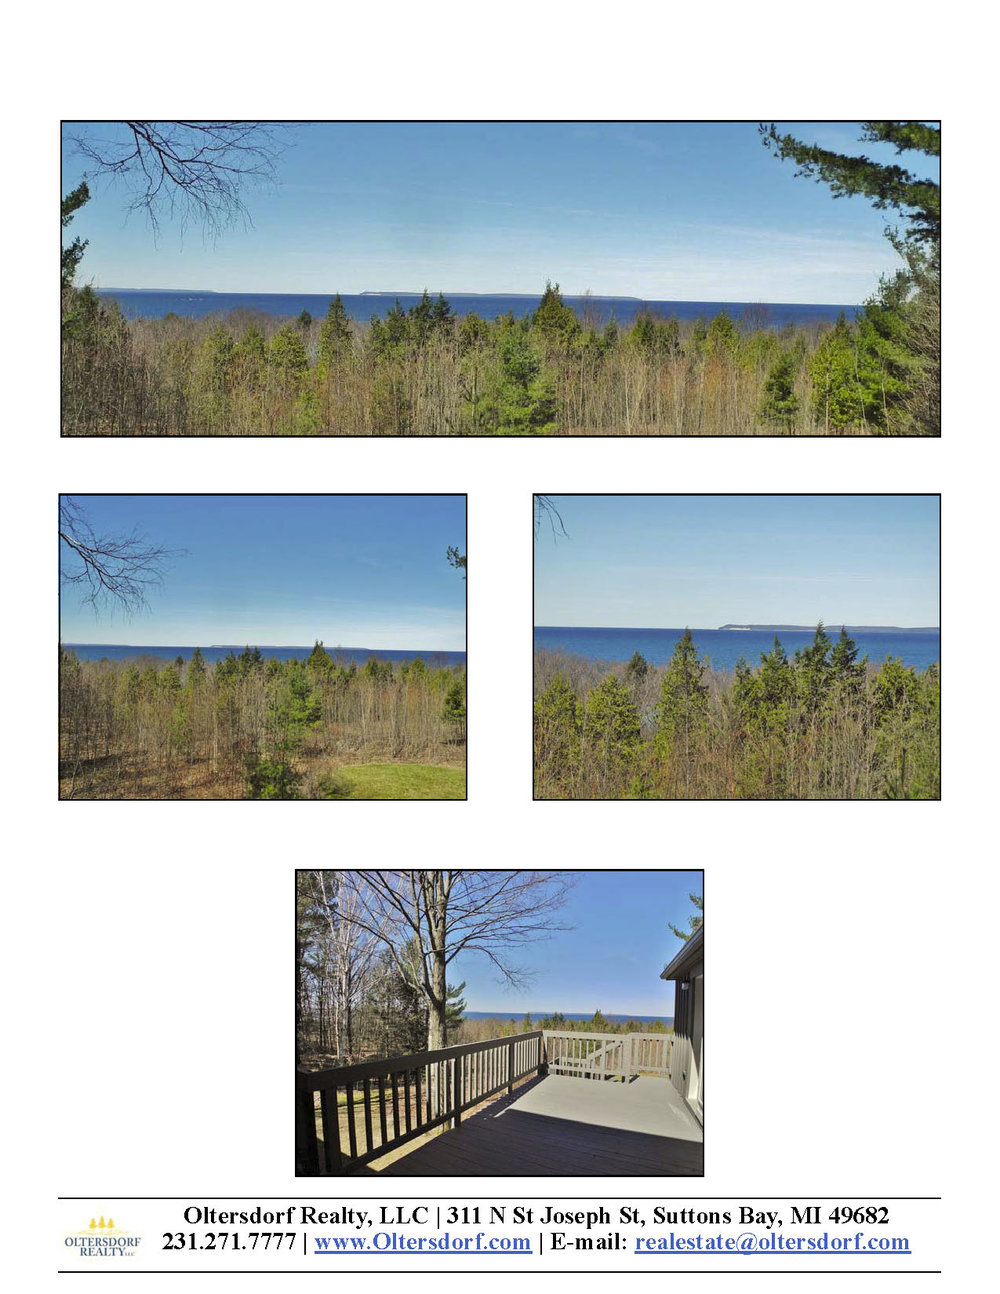 564 S Woodsmoke Drive, Lake Leelanau, MI – Sunset Lake Michigan Water Views - For Sale by Oltersdorf Realty - Marketing Packet (2).jpg